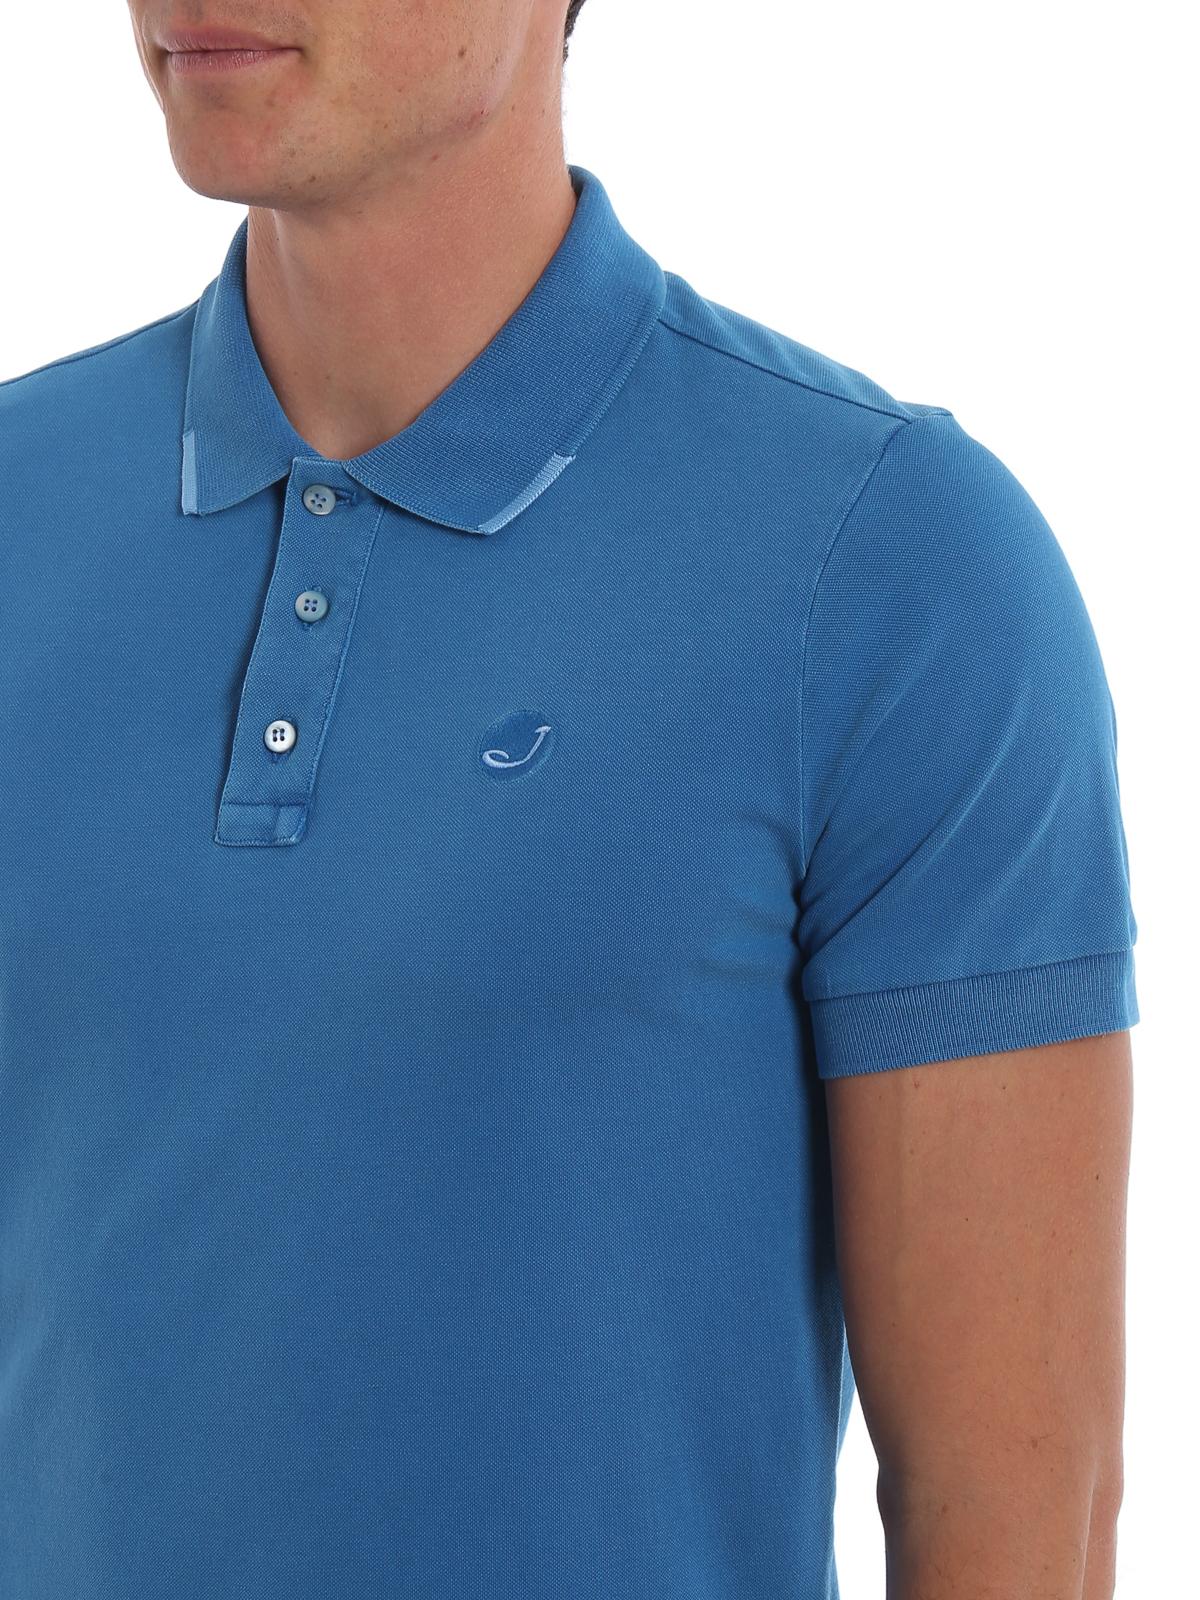 new concept d3682 ccec3 Jacob Cohen - Poloshirt - Blau - Poloshirts - J403700188807 ...